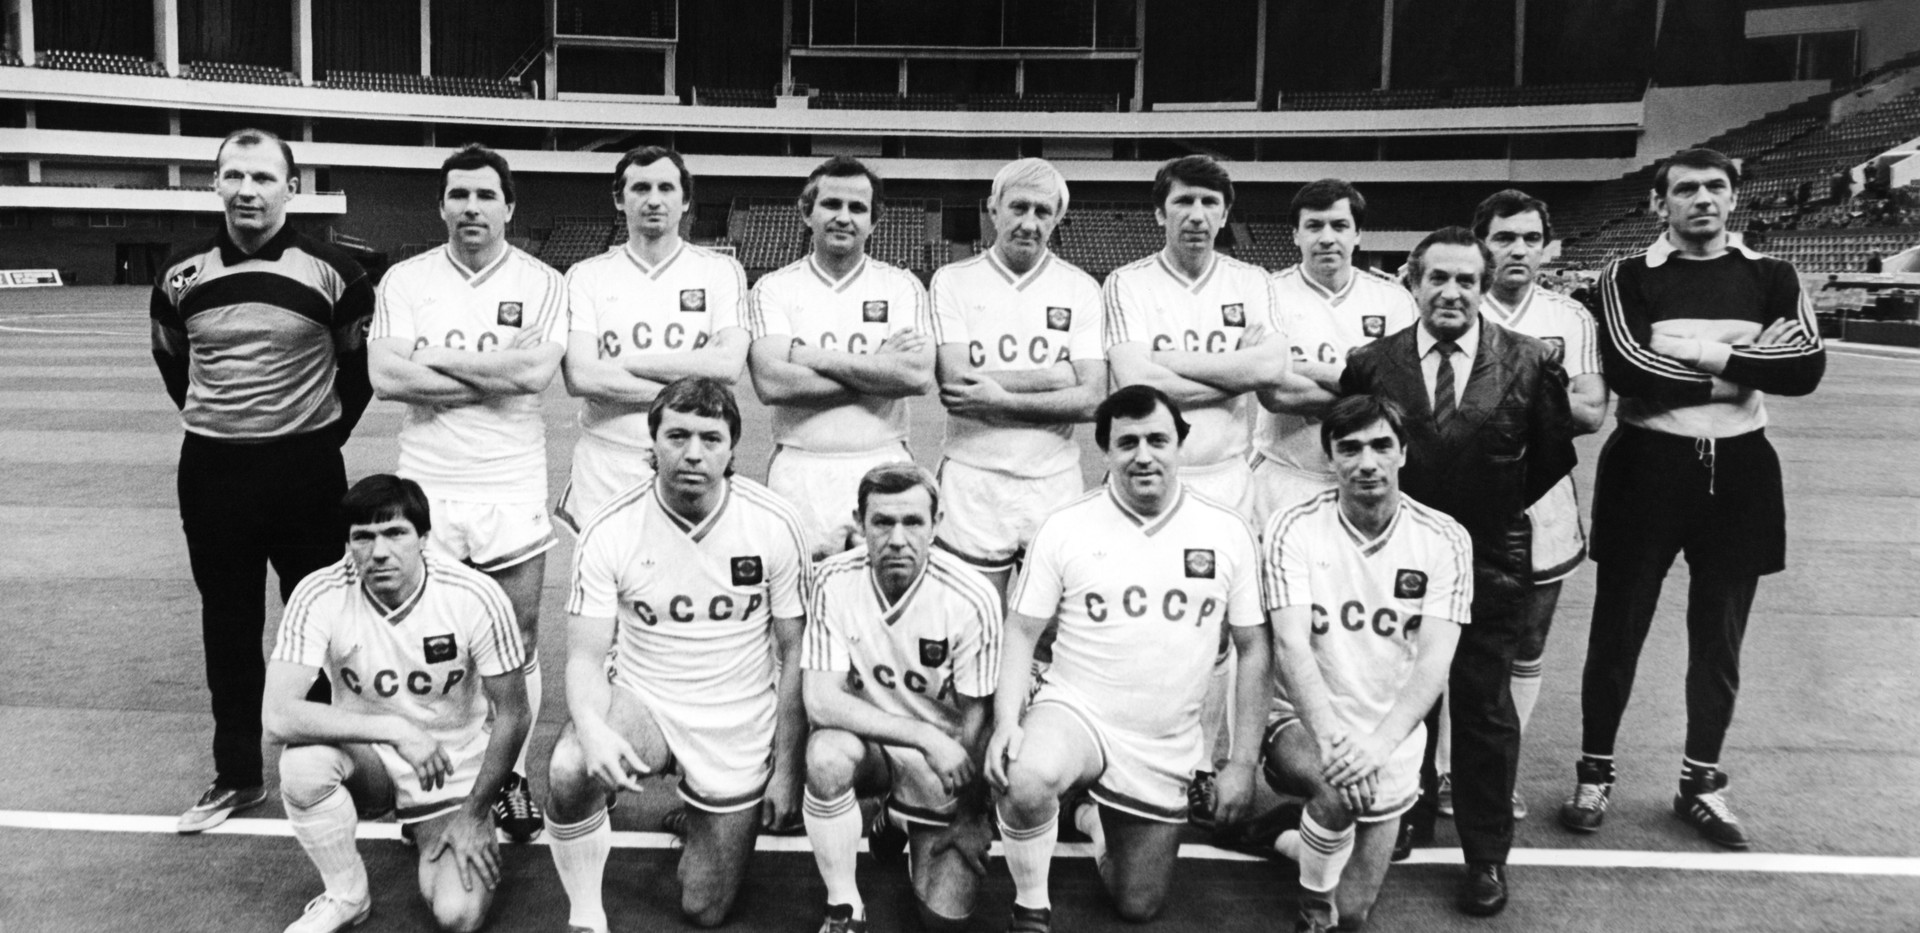 USSR-Mirzoyan-3.jpg